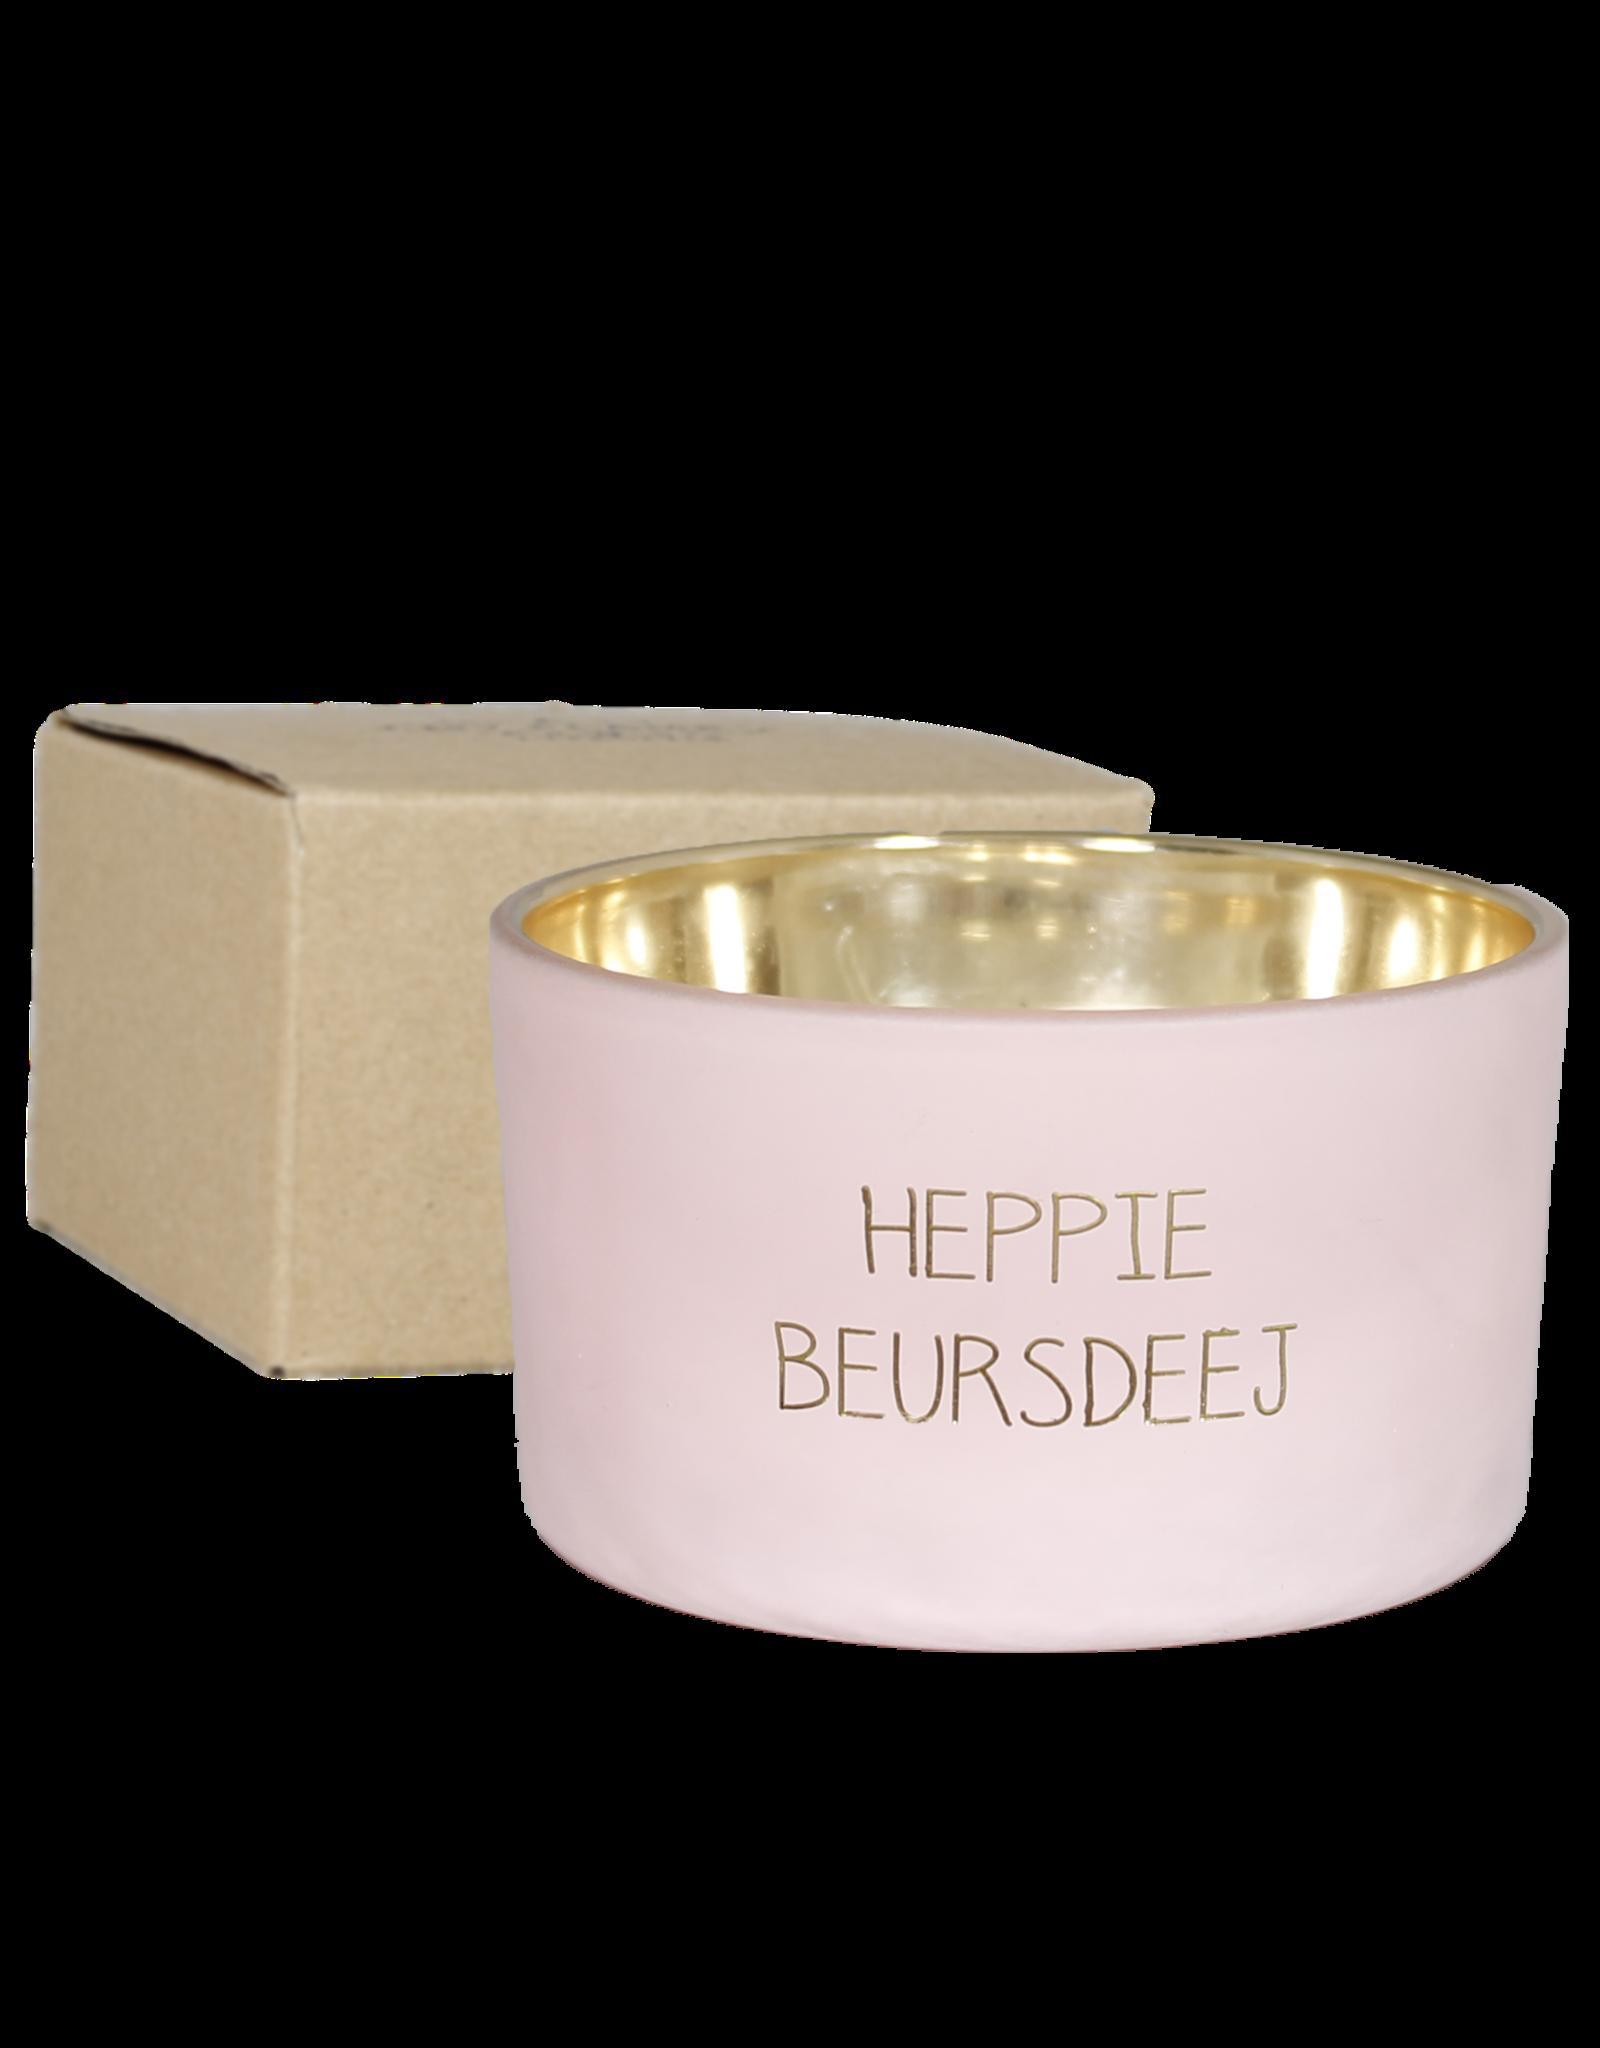 My flame Lifestyle SOJAKAARS MET HOUTEN LONT | HAPPY BEURSDEEJ | GEUR: GREEN TEA TIME